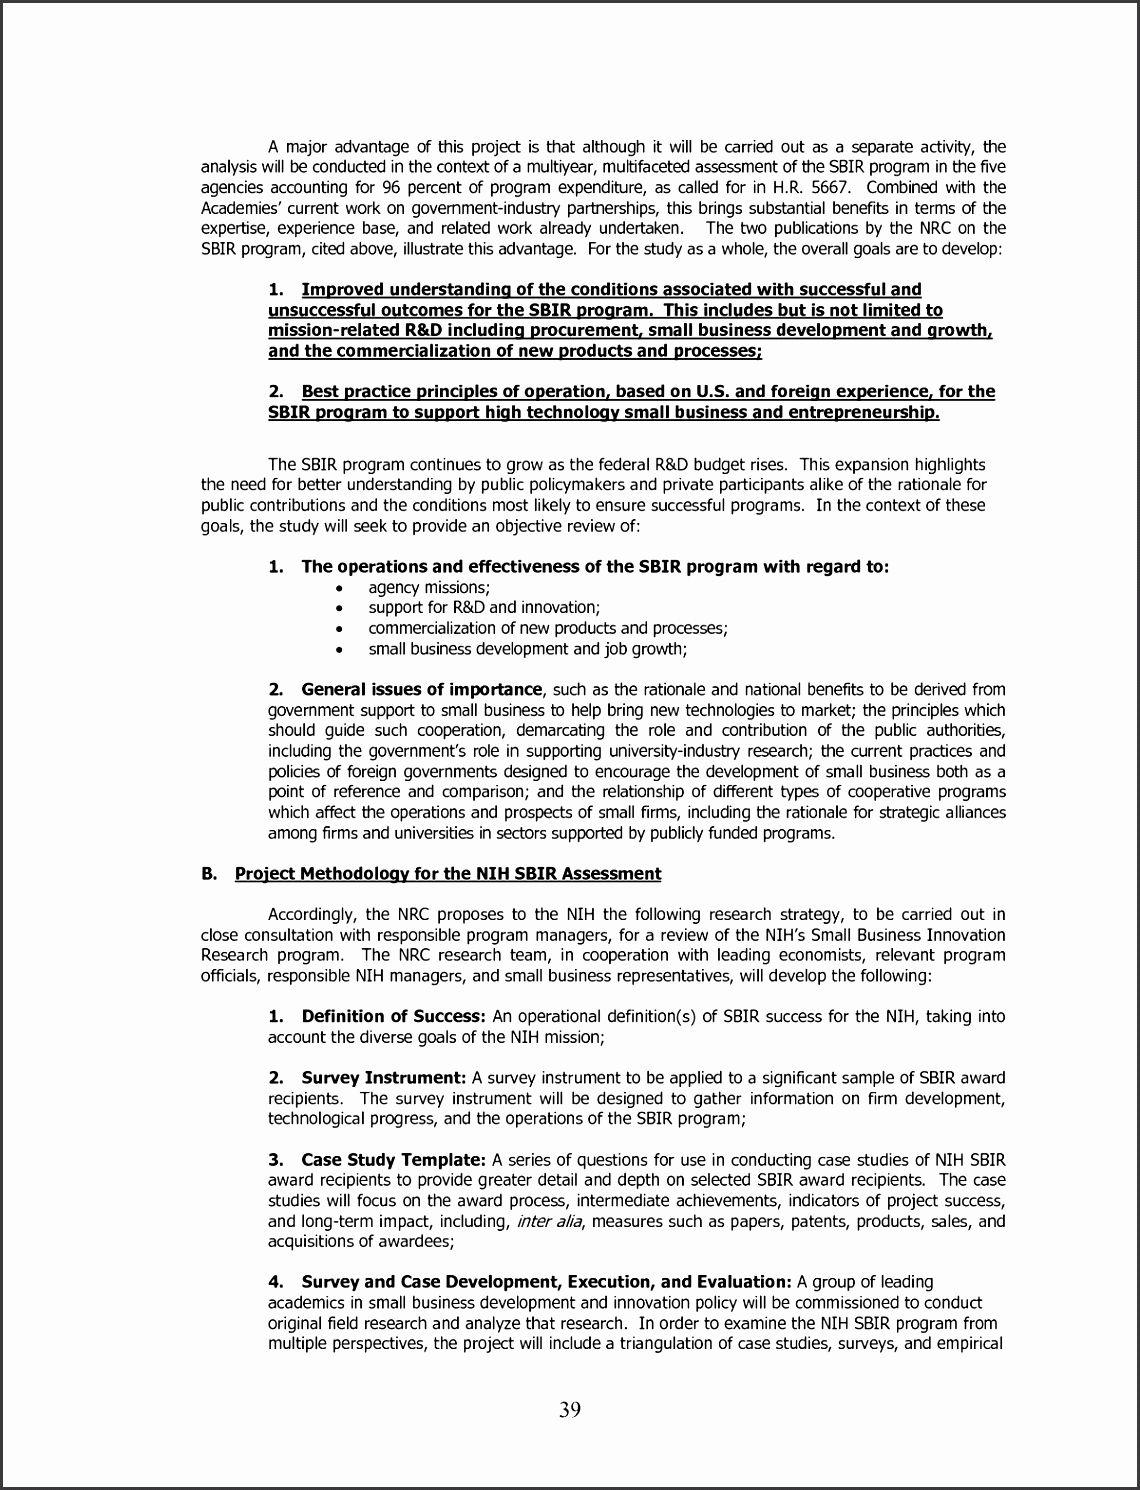 Affirmative Action Plan Template Elegant 6 Professional Action Plan Template Sampletemplatess Proposal Templates Proposal Letter Grant Proposal